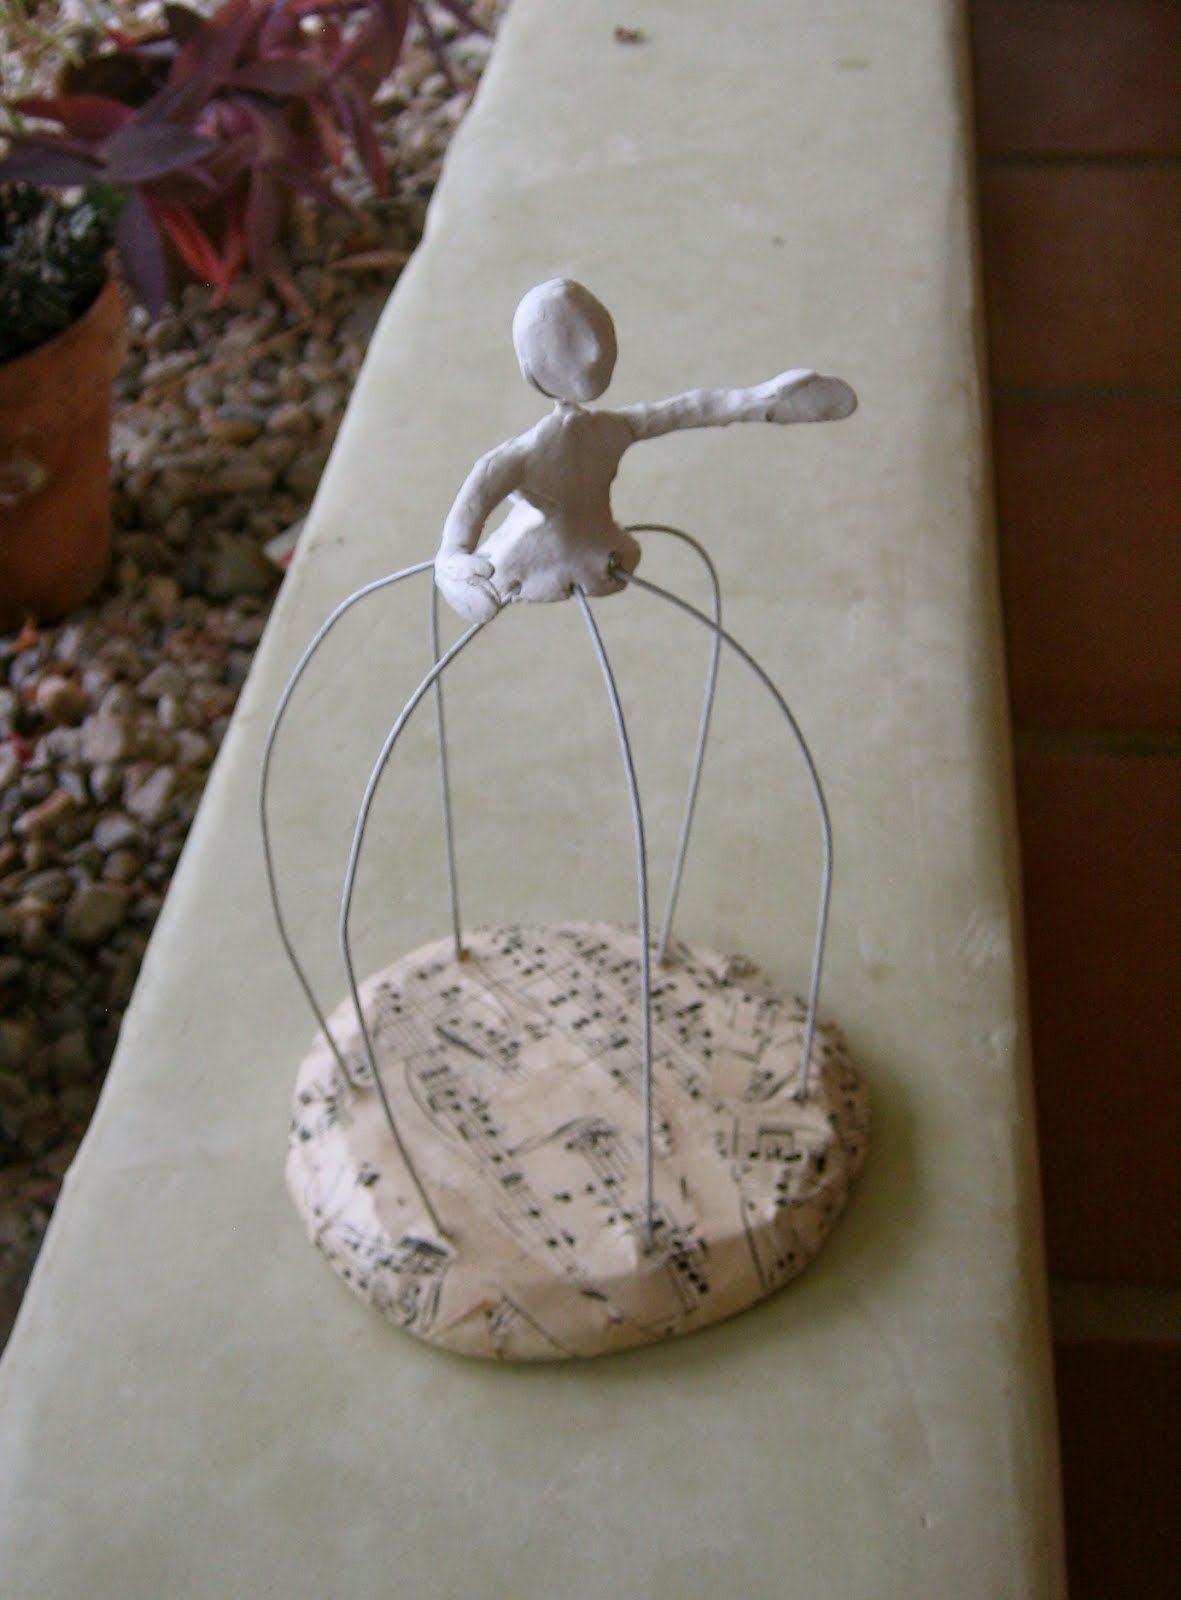 pin by susan blalock on santos cage dolls sculptures. Black Bedroom Furniture Sets. Home Design Ideas